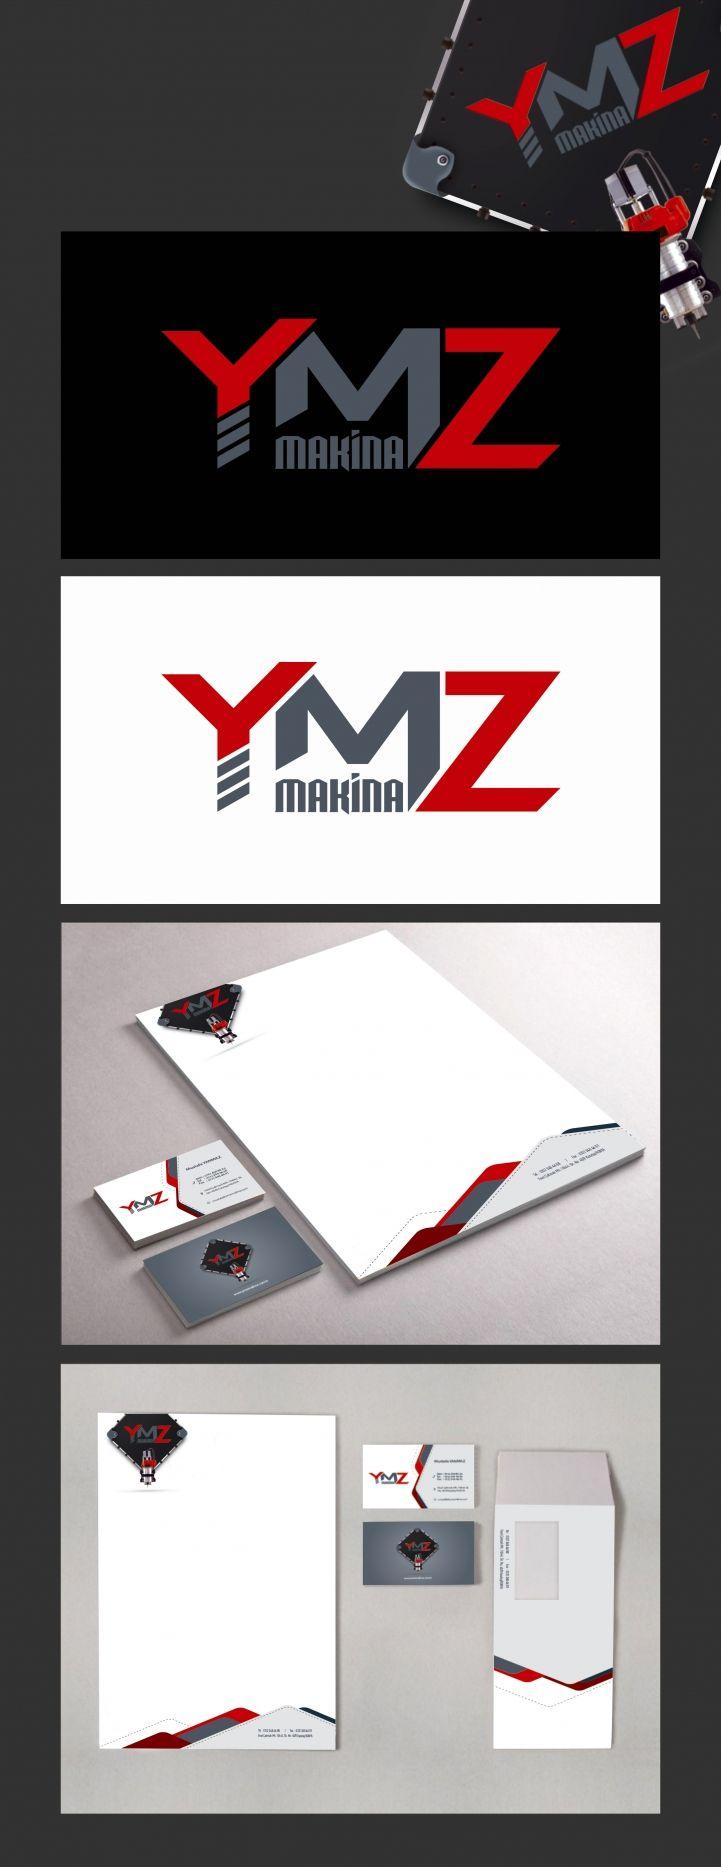 Konya Reklam Ajansı Masske - YMZ Makina